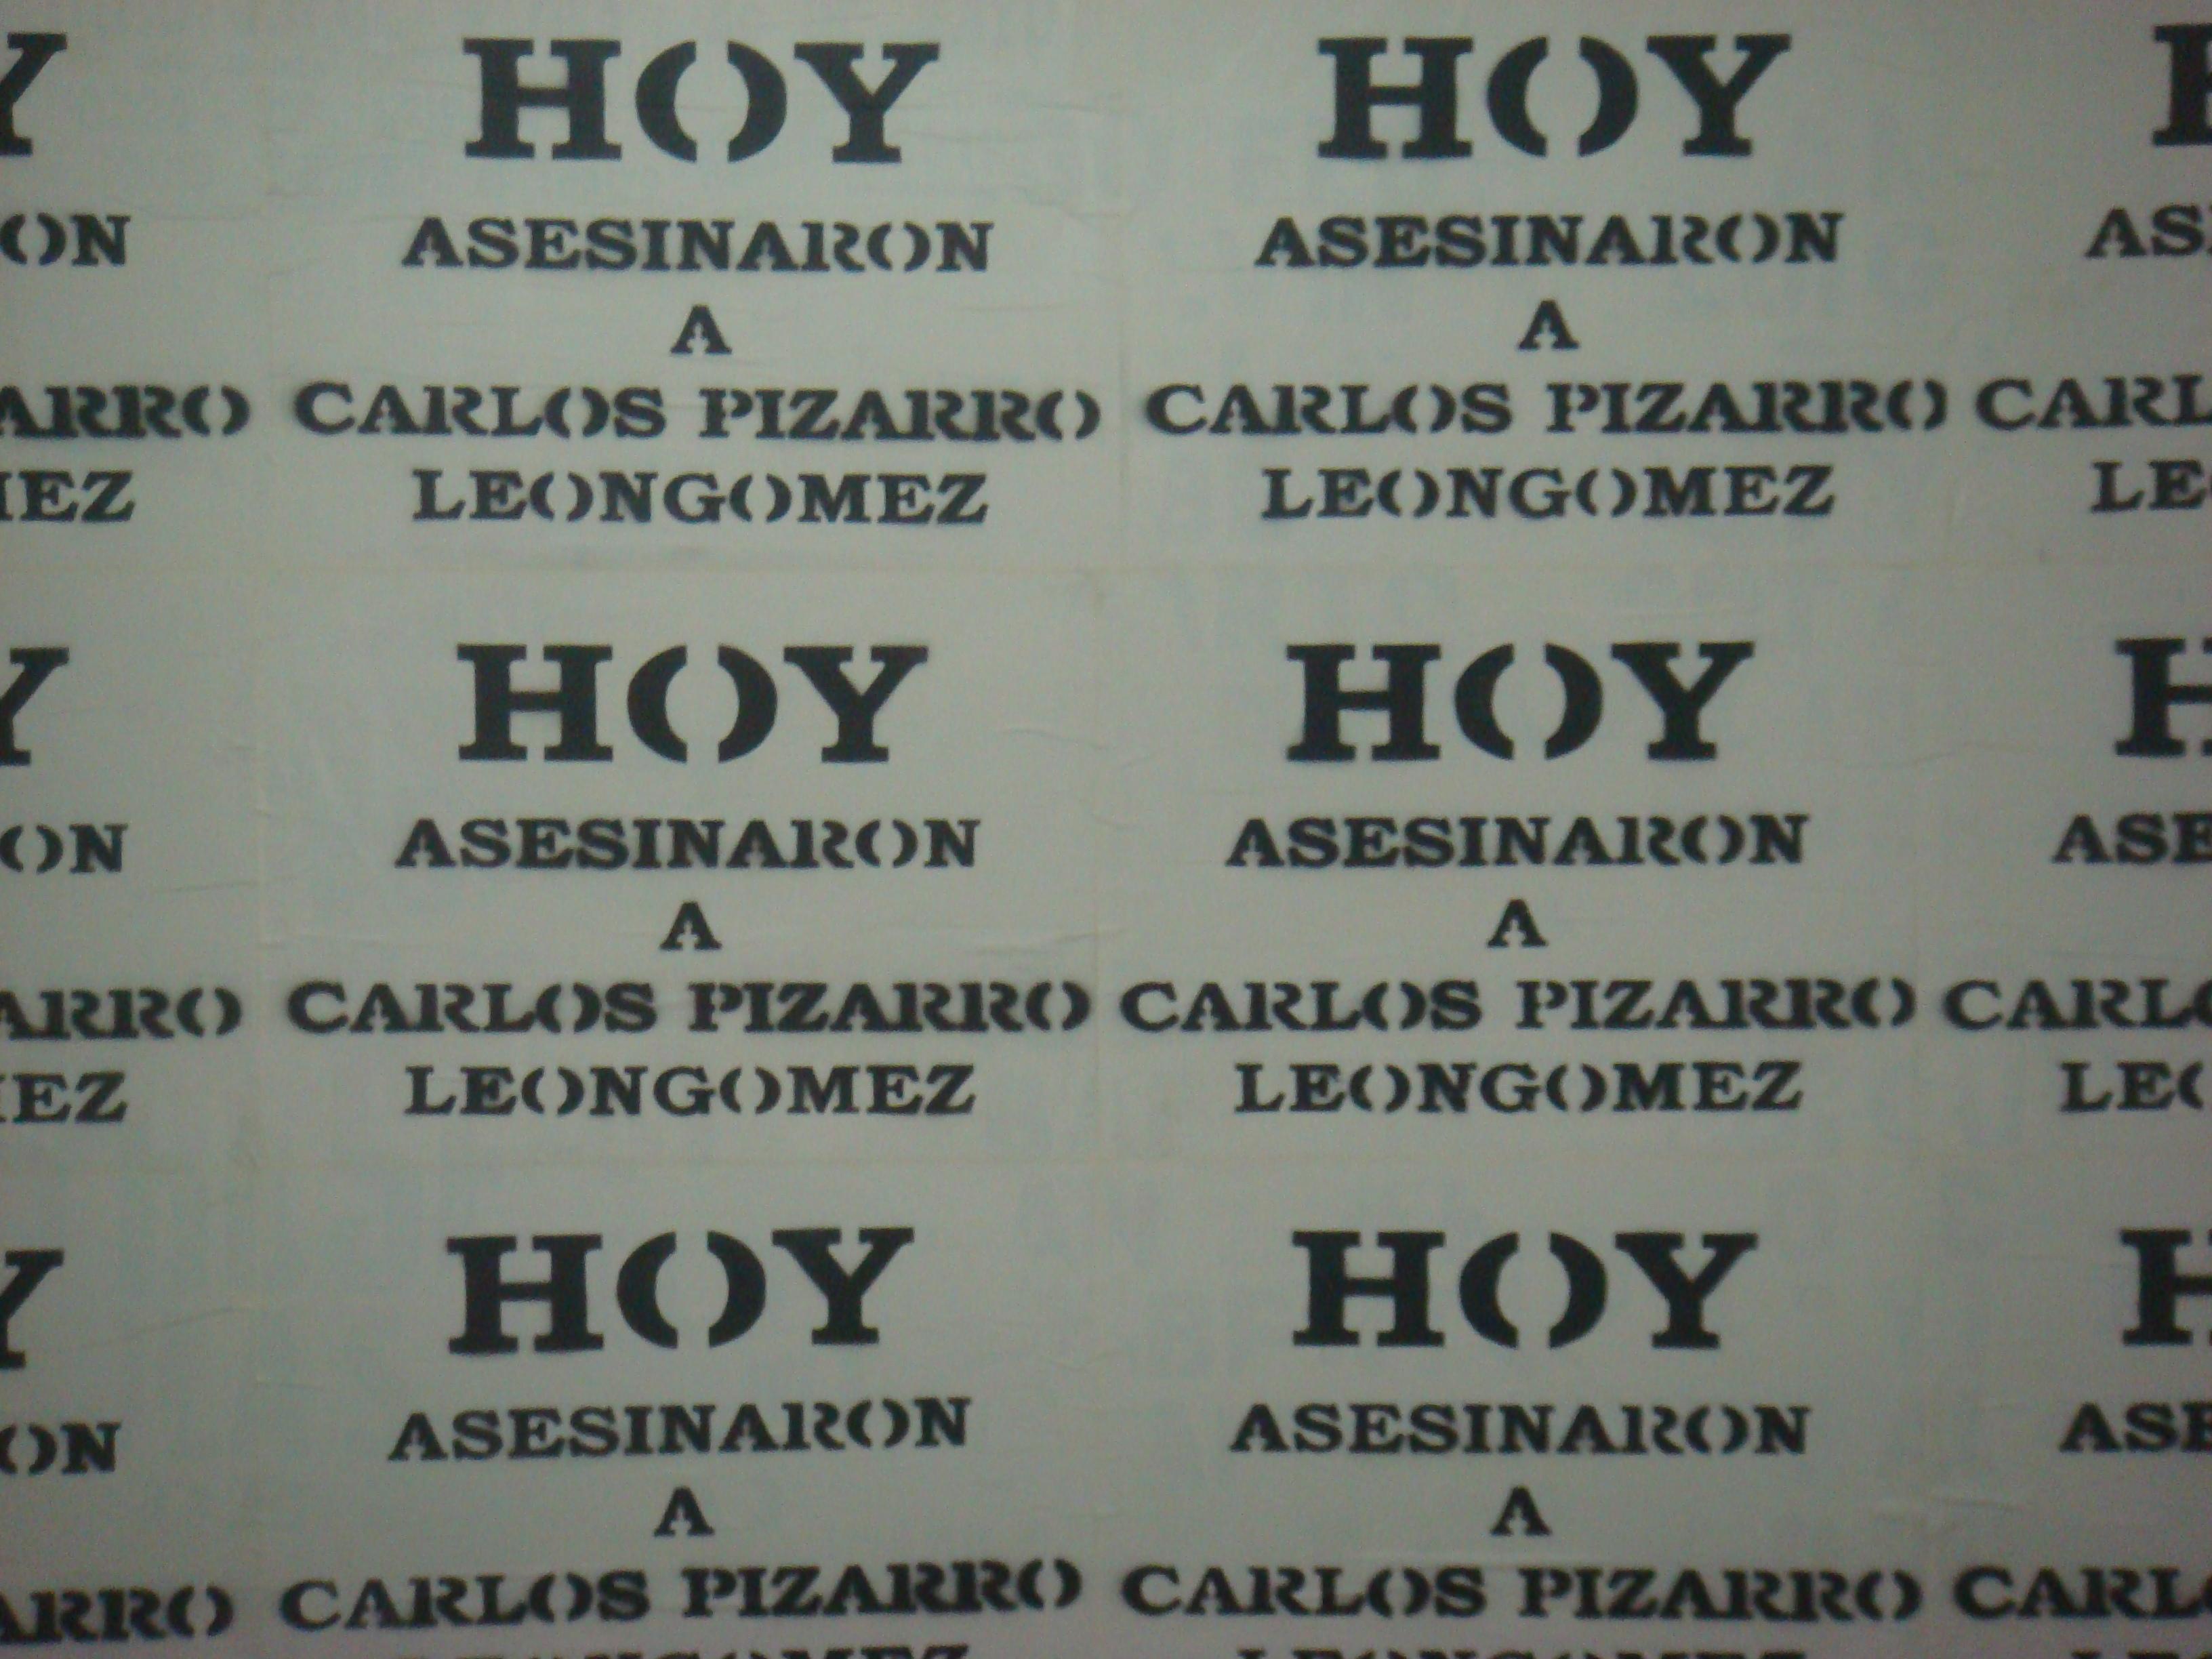 Leonardo Herrera - Hoy Asesinaron a Carlos Pizarro Leon Gomez (2010)